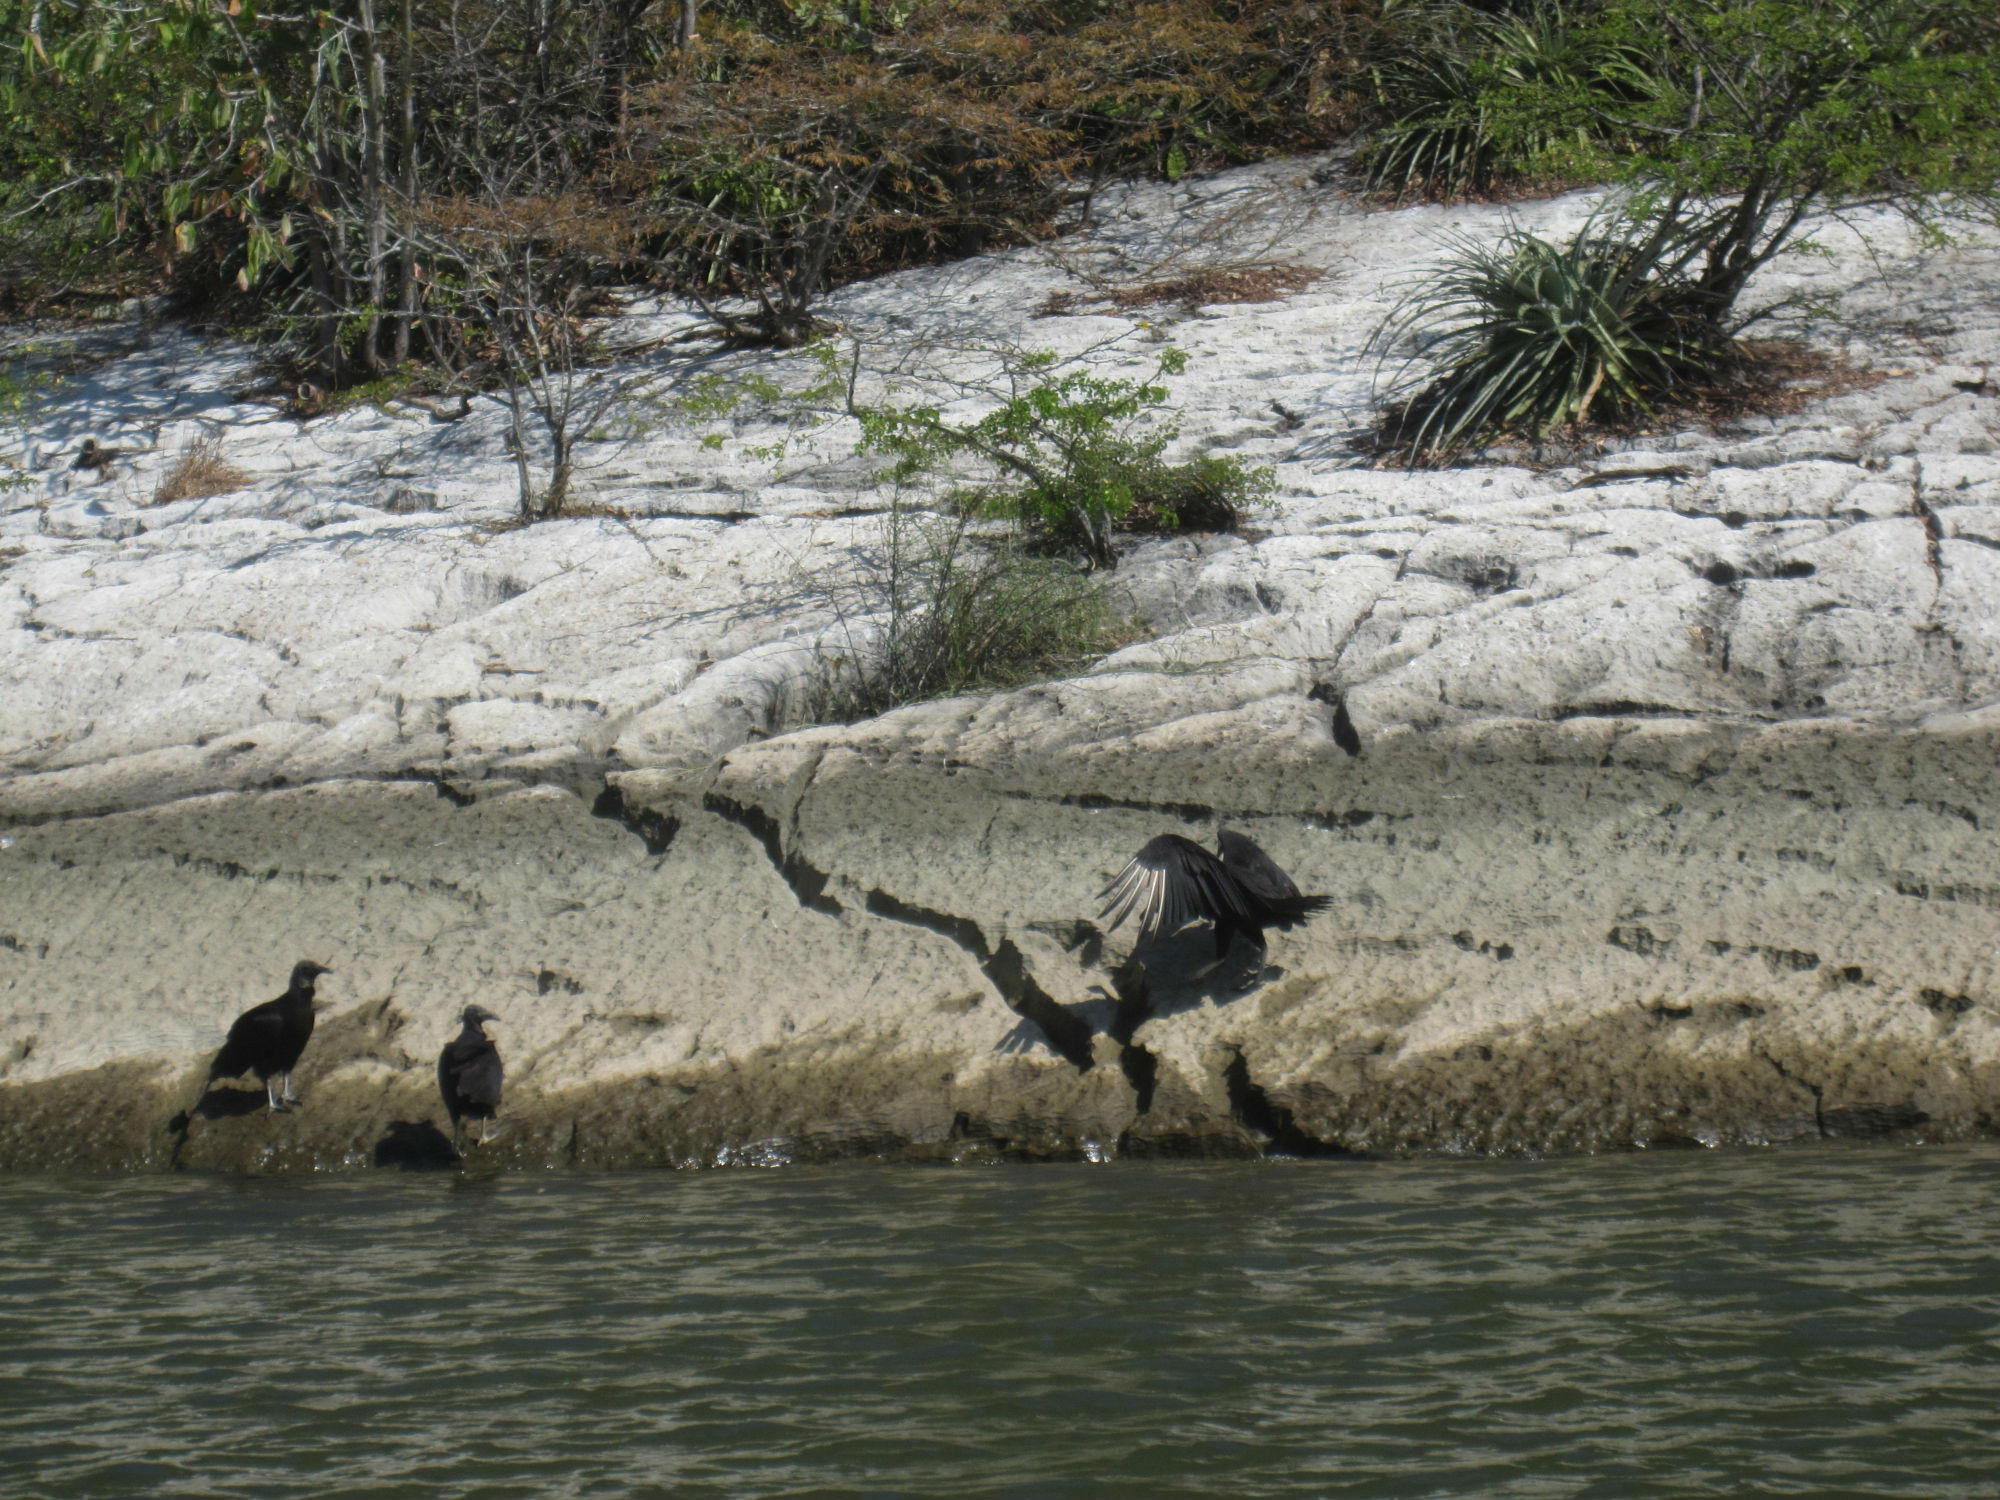 Vi såg väldigt många olika sorters fåglar i kanjonen, men de var rätt svårt att få bra bilder på dem! We saw a lot of different kinds of birds in the canyon, but there were quite difficult to take good pictures of them!